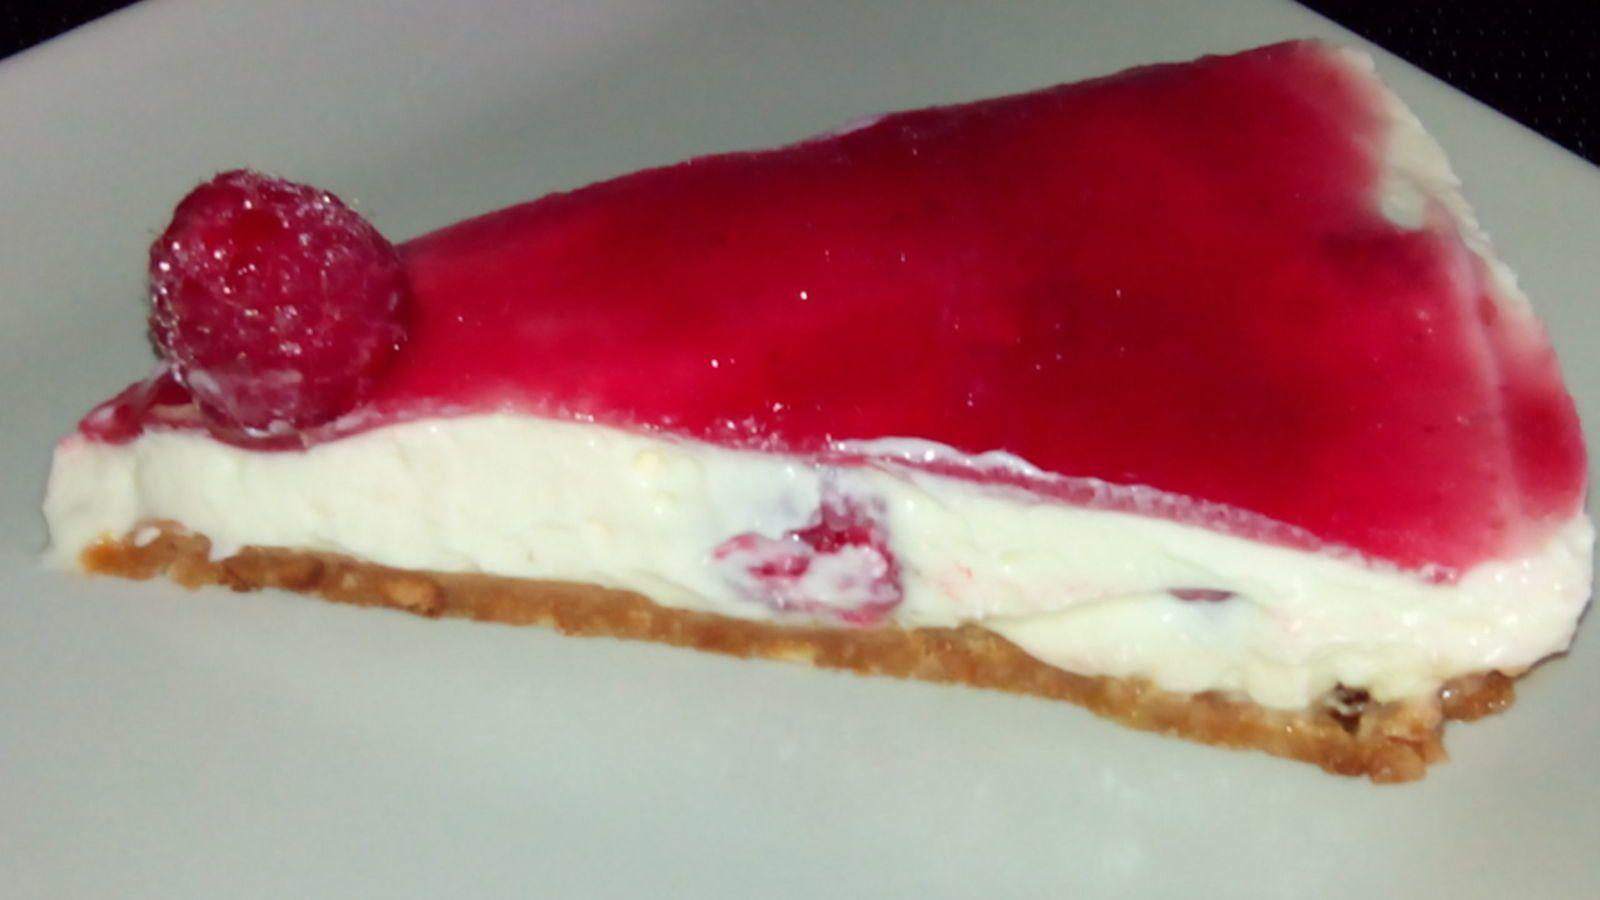 Cheesecake sans cuisson aux framboises passetempscuisine - Cheesecake framboise sans cuisson ...